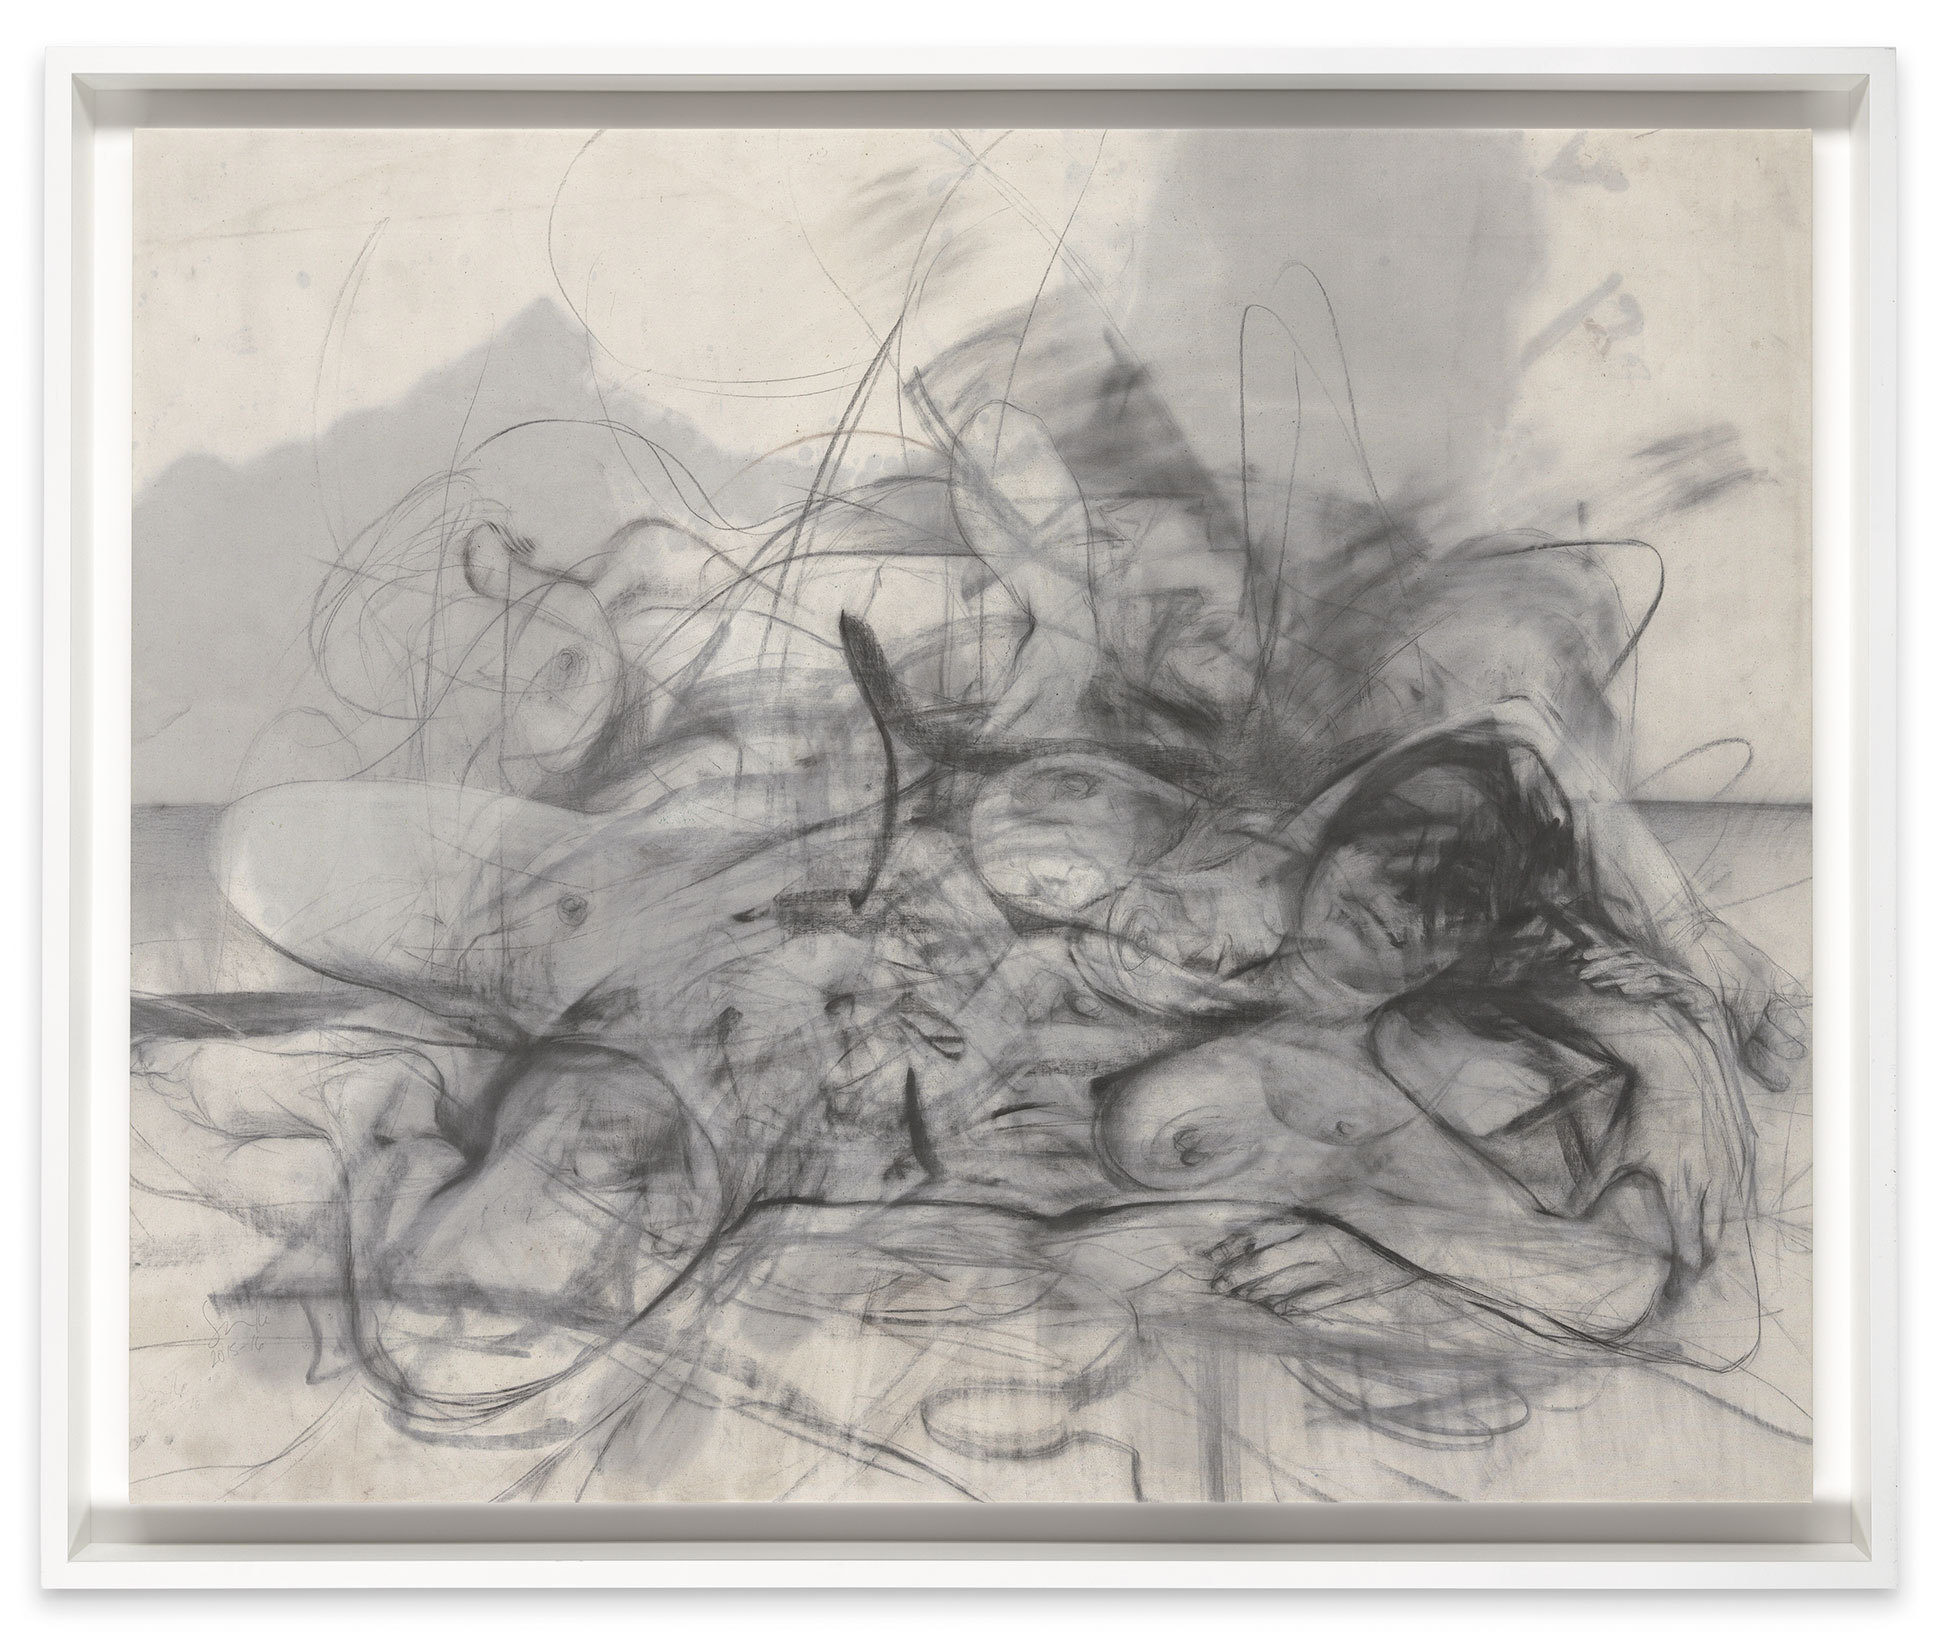 Jenny Saville: 'Ashes'.